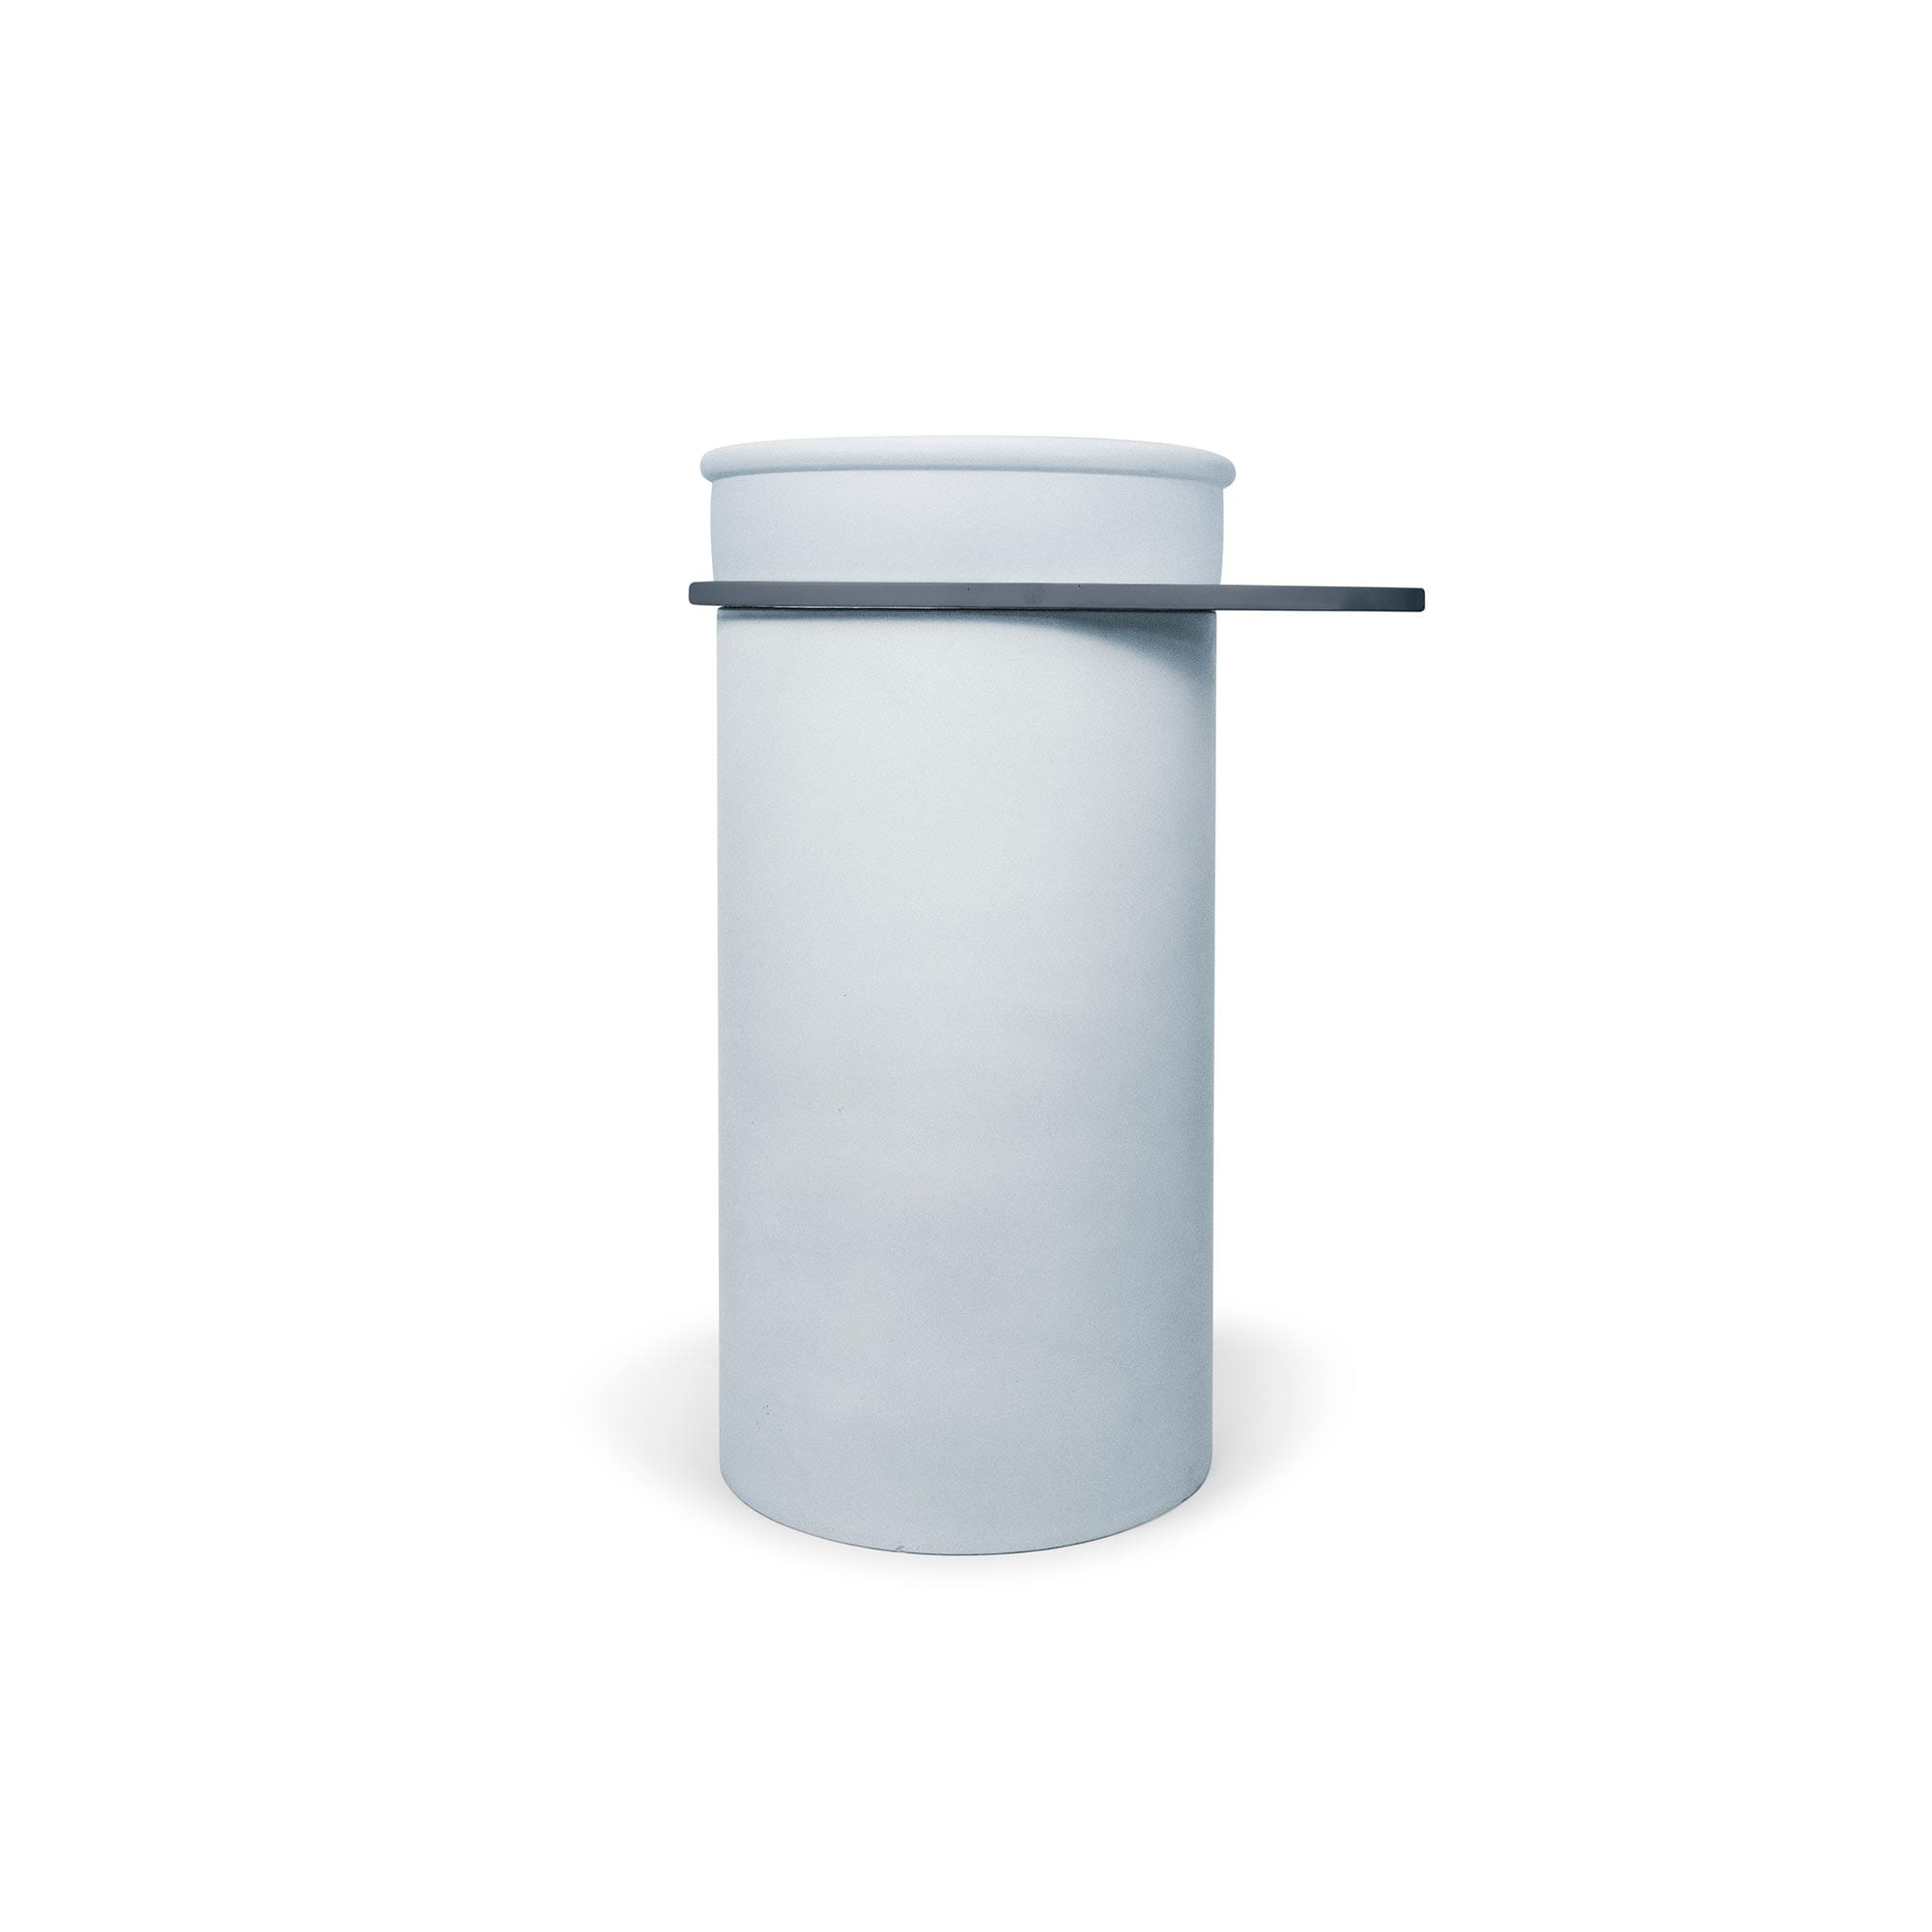 Tubb Basin Cylinder 7